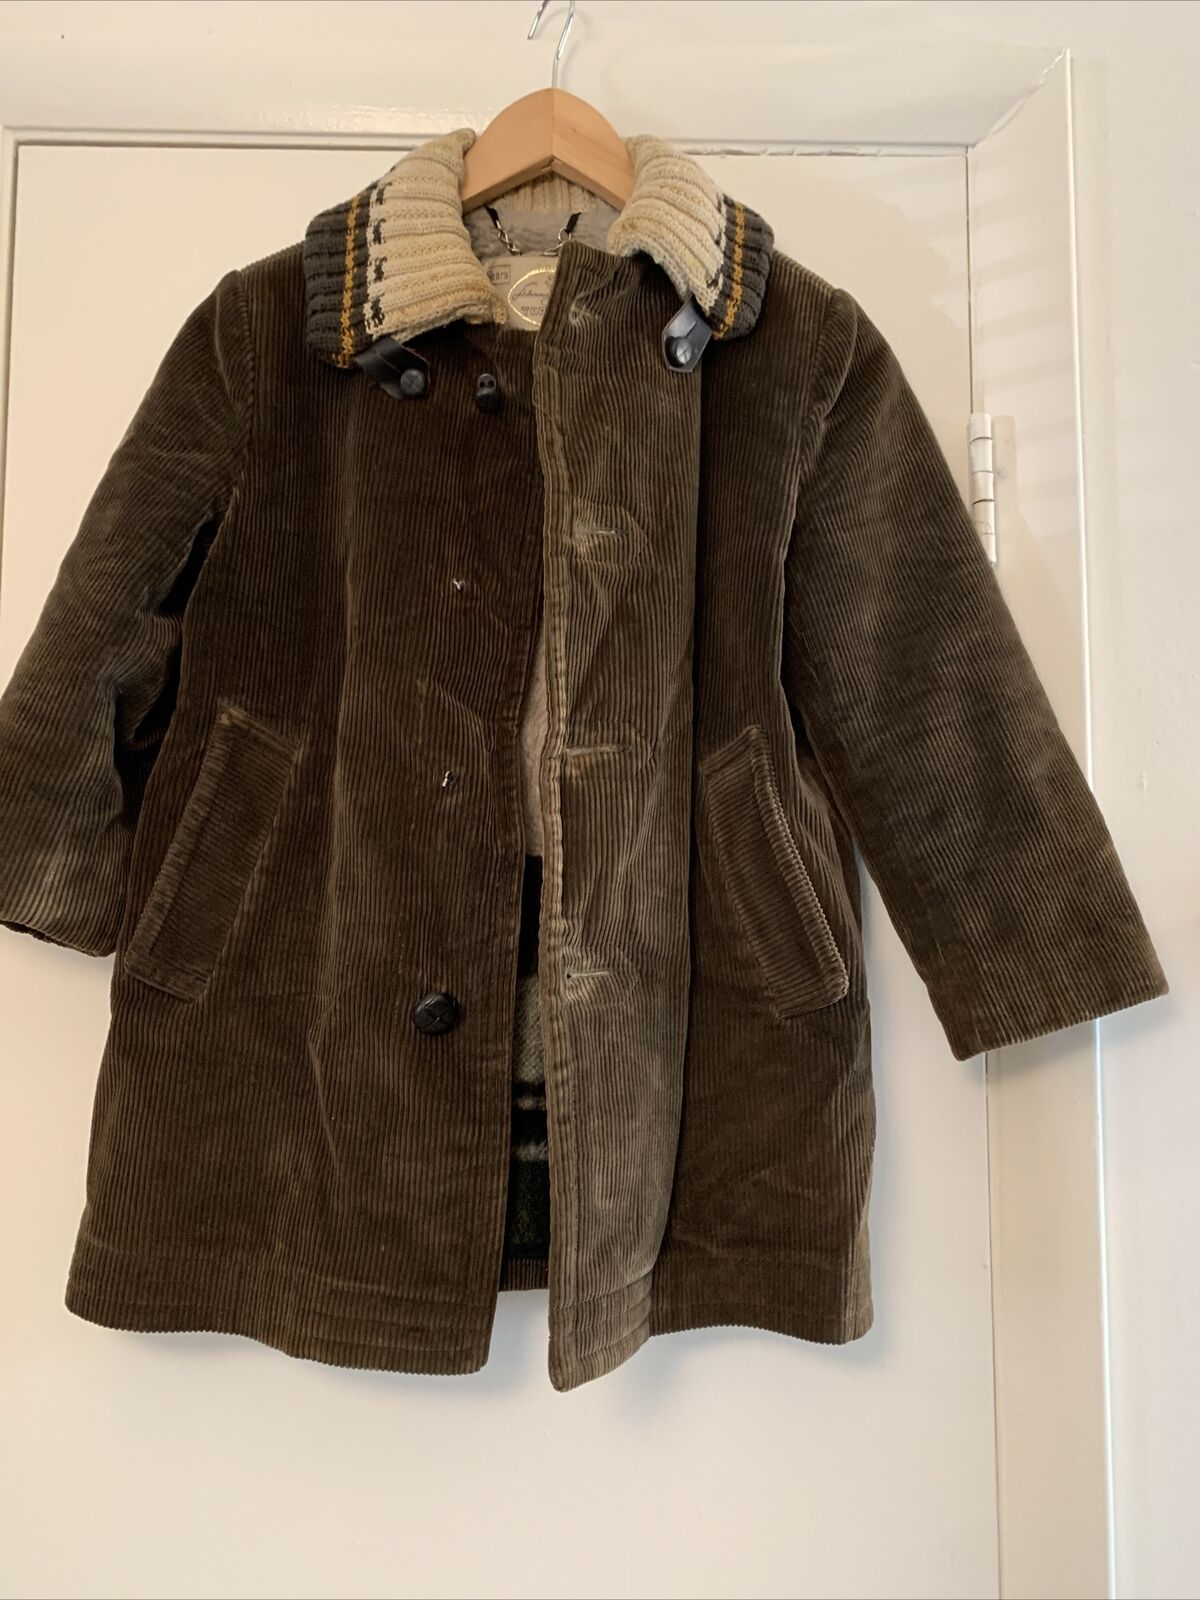 Vtg Sears Johnny Unitas Top pro Acrilan warm coat Made in USA courdroy brown